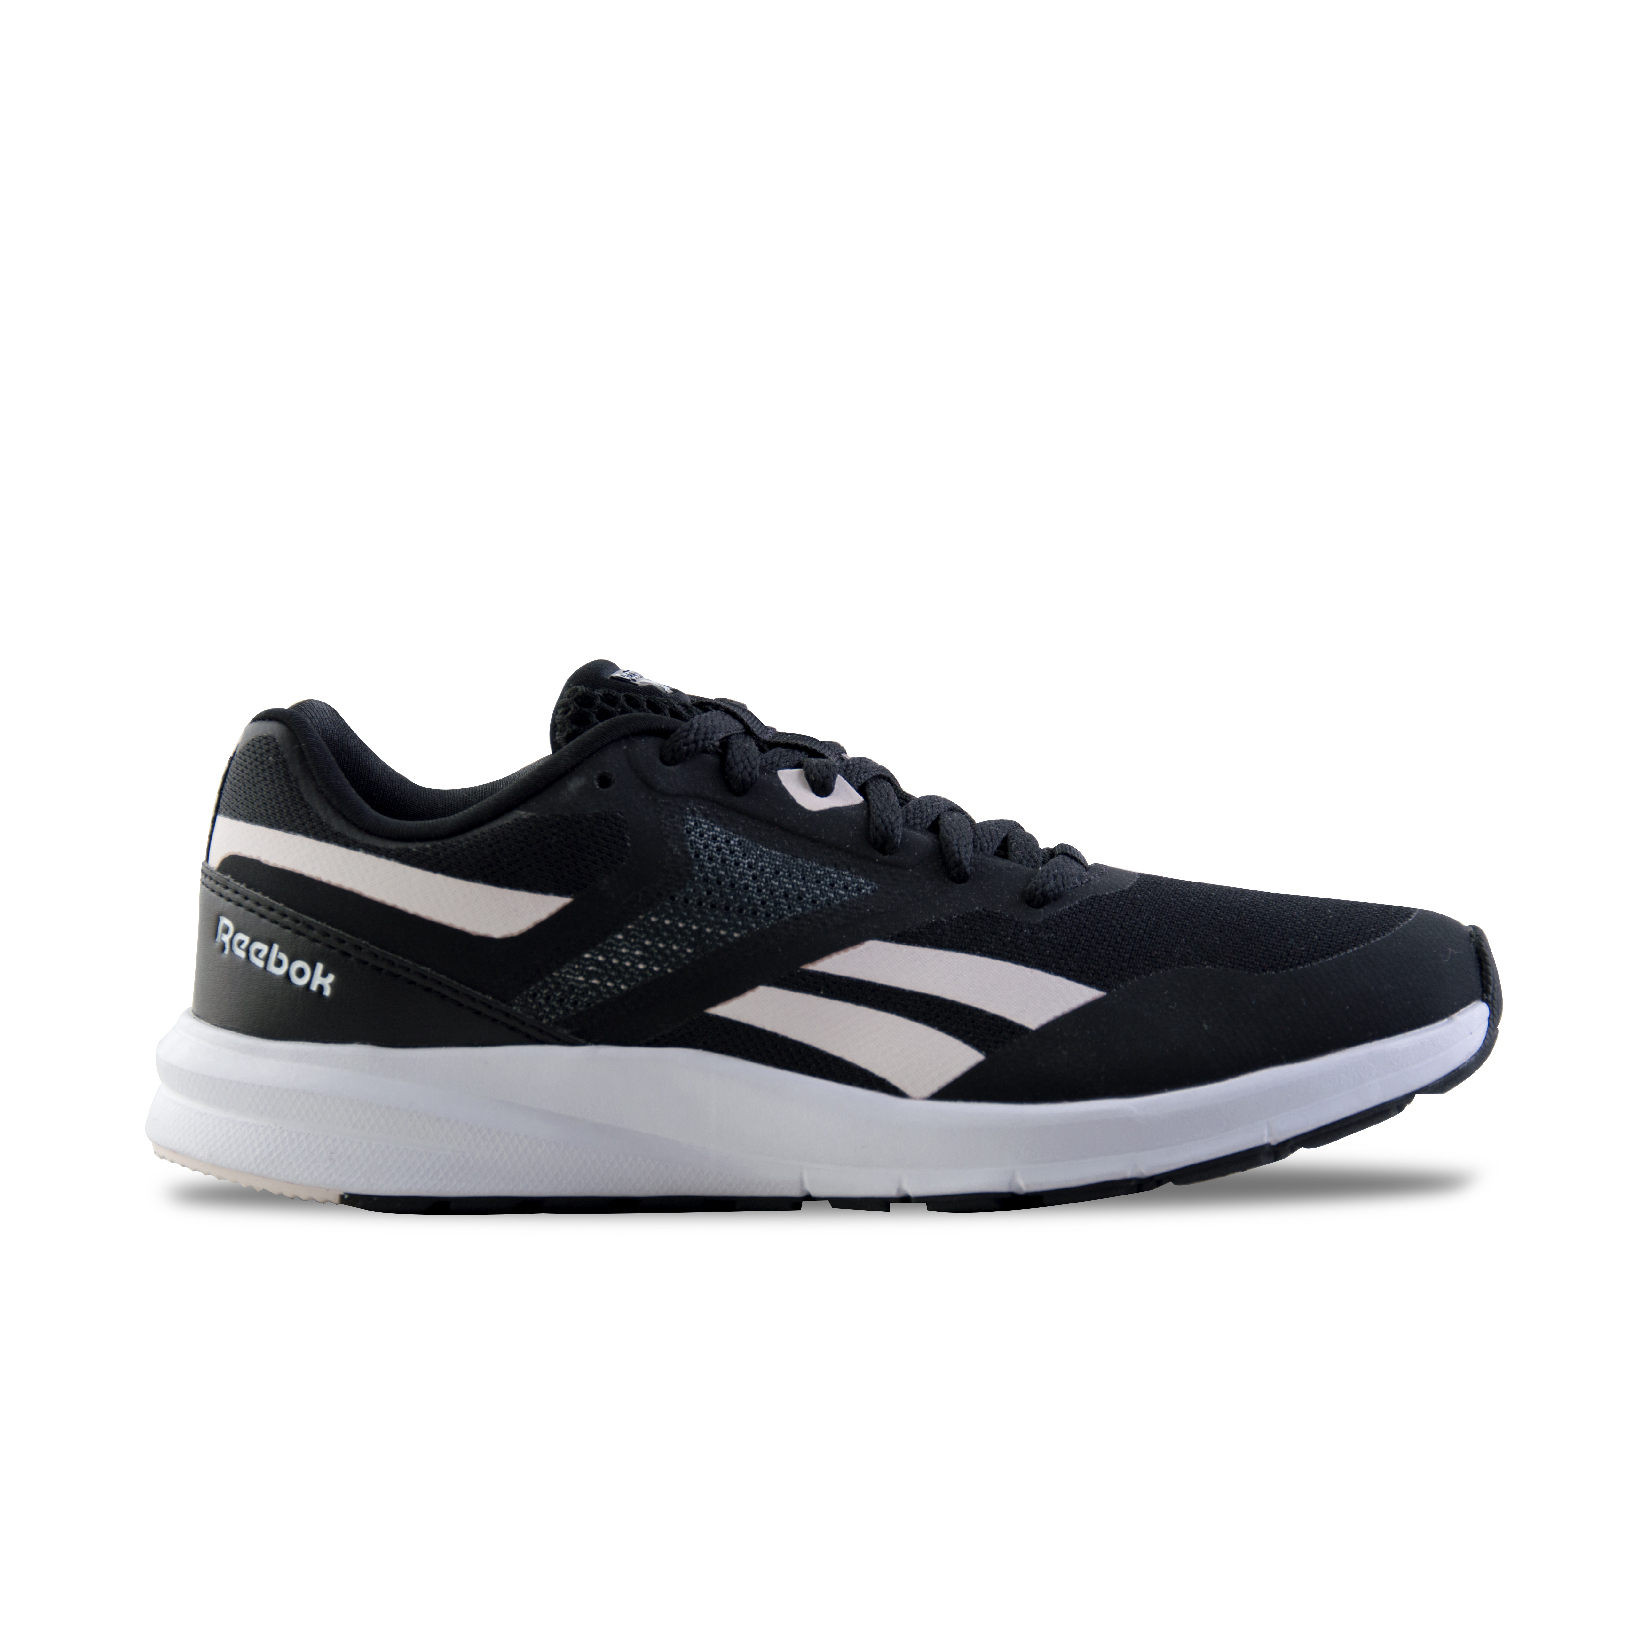 Reebok Sport Runner 4 Black